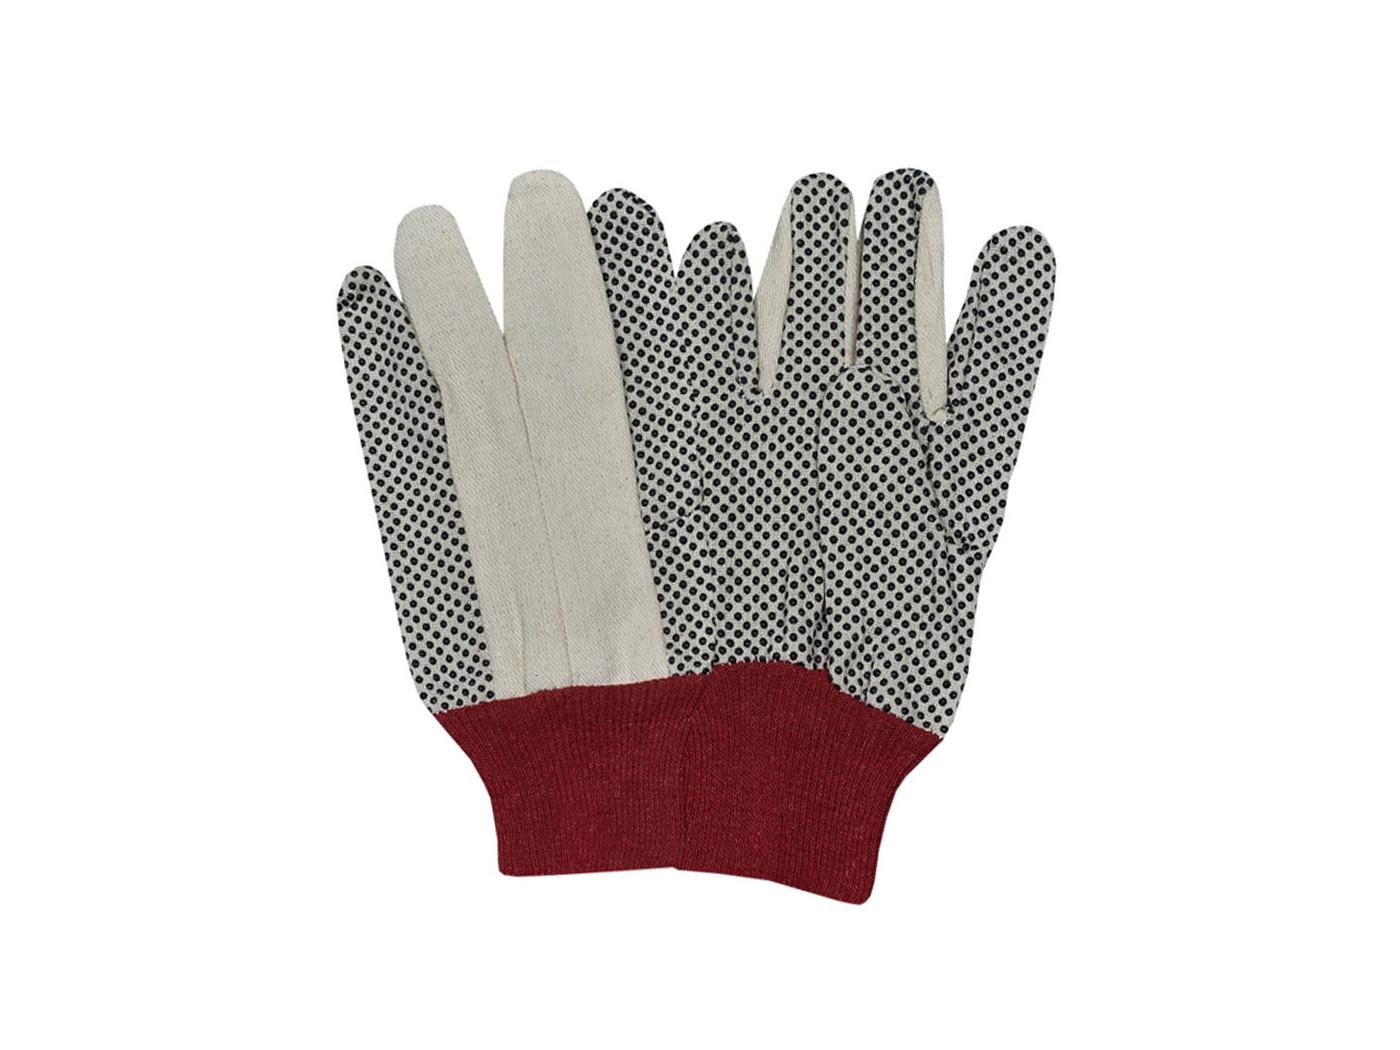 Drill Gloves Supplier in Abu dhabi